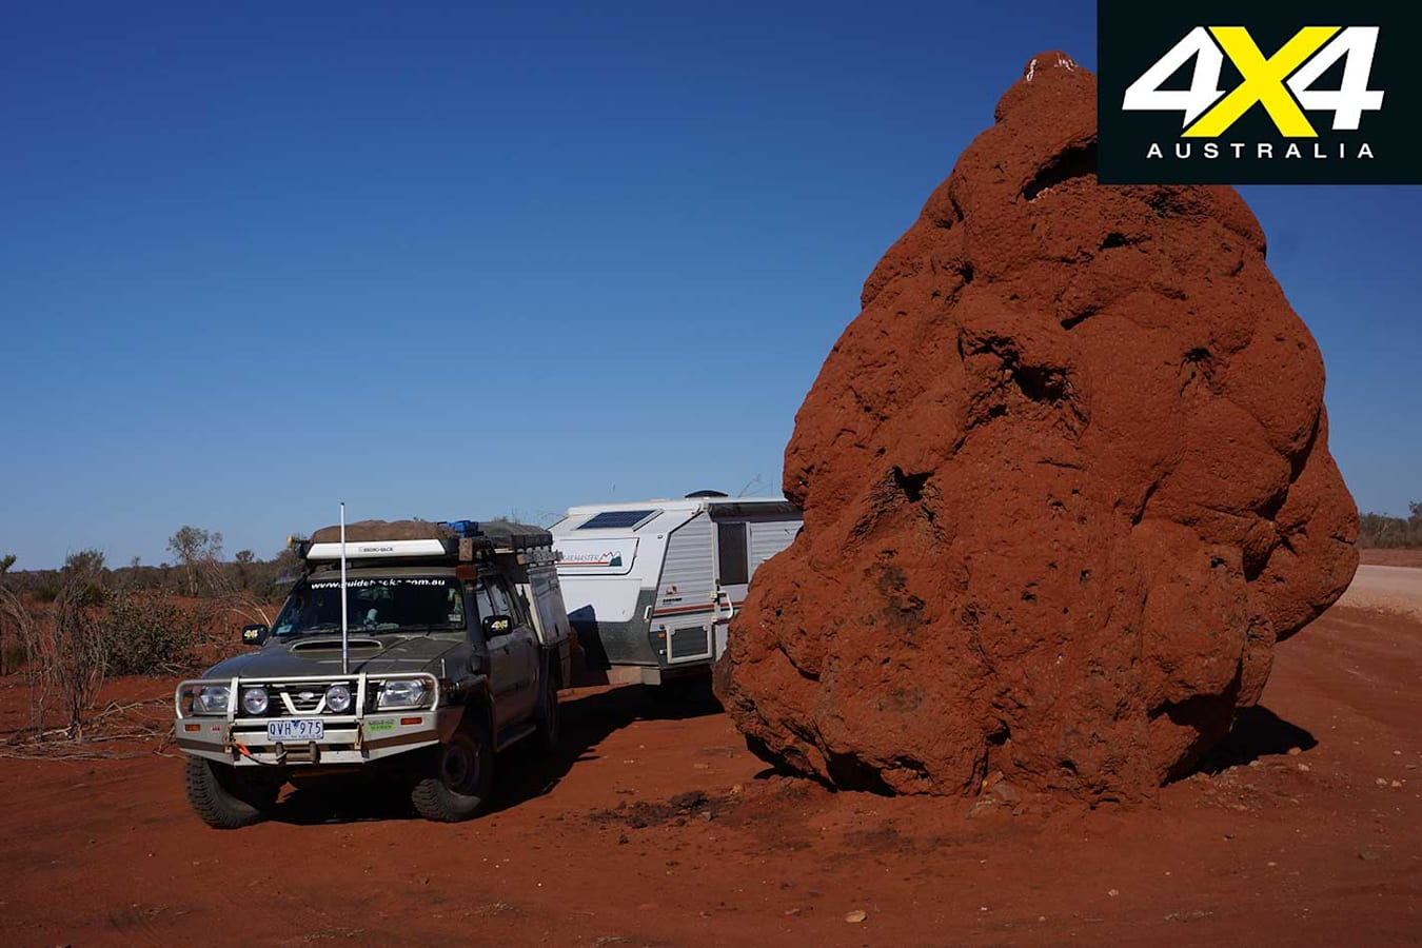 Plenty Highway NT Termite Mound Jpg